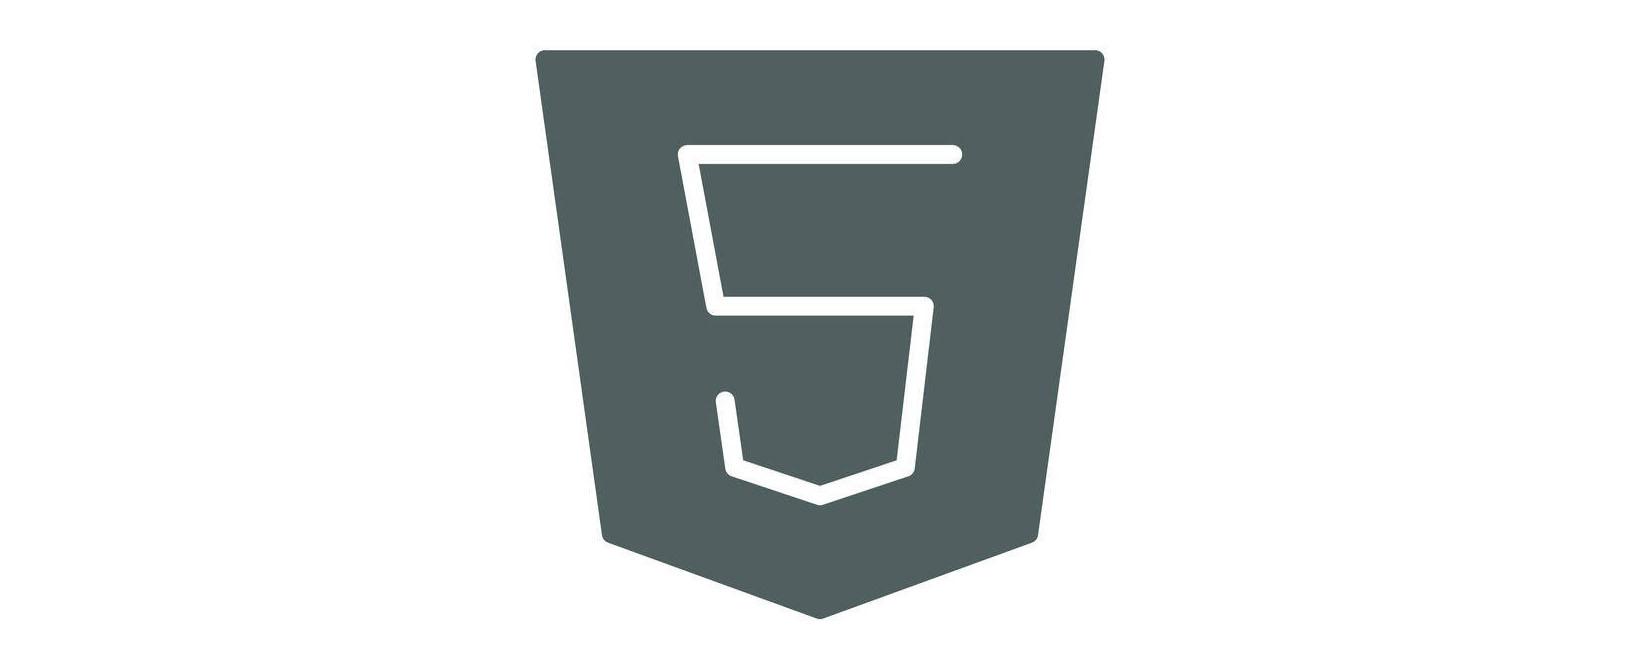 HTML5画布如何设置字体颜色?(代码示例)